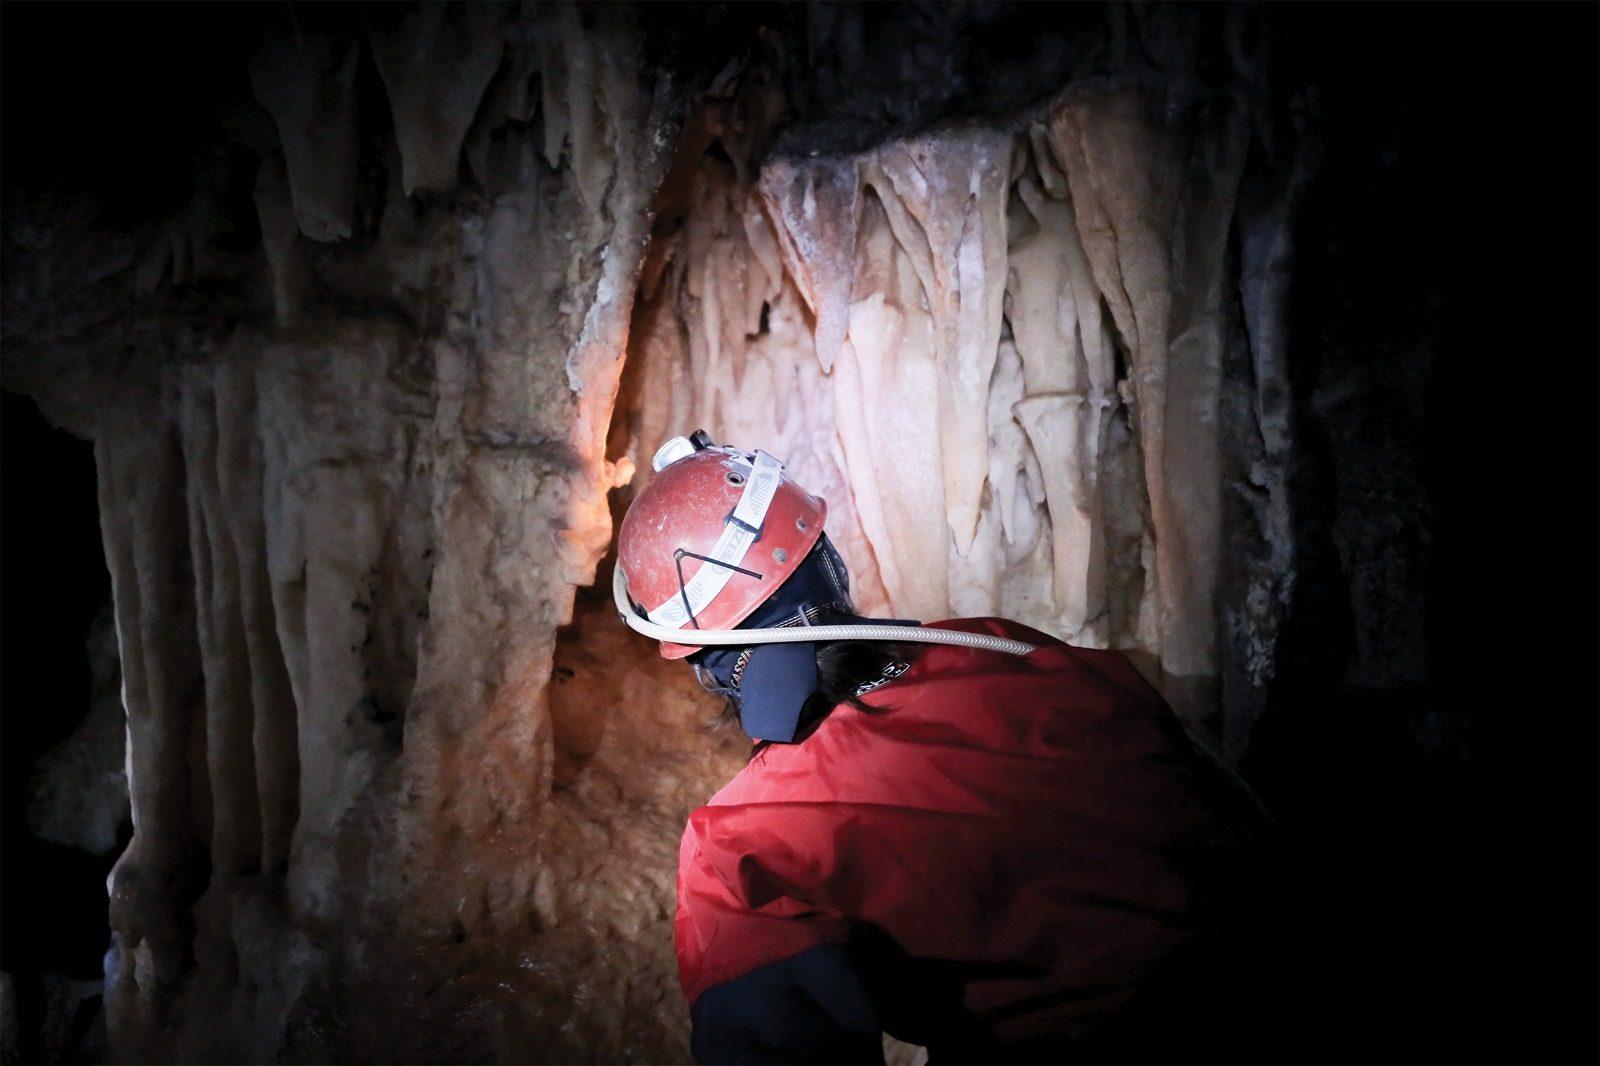 Grotte, Turismo, Ricerca